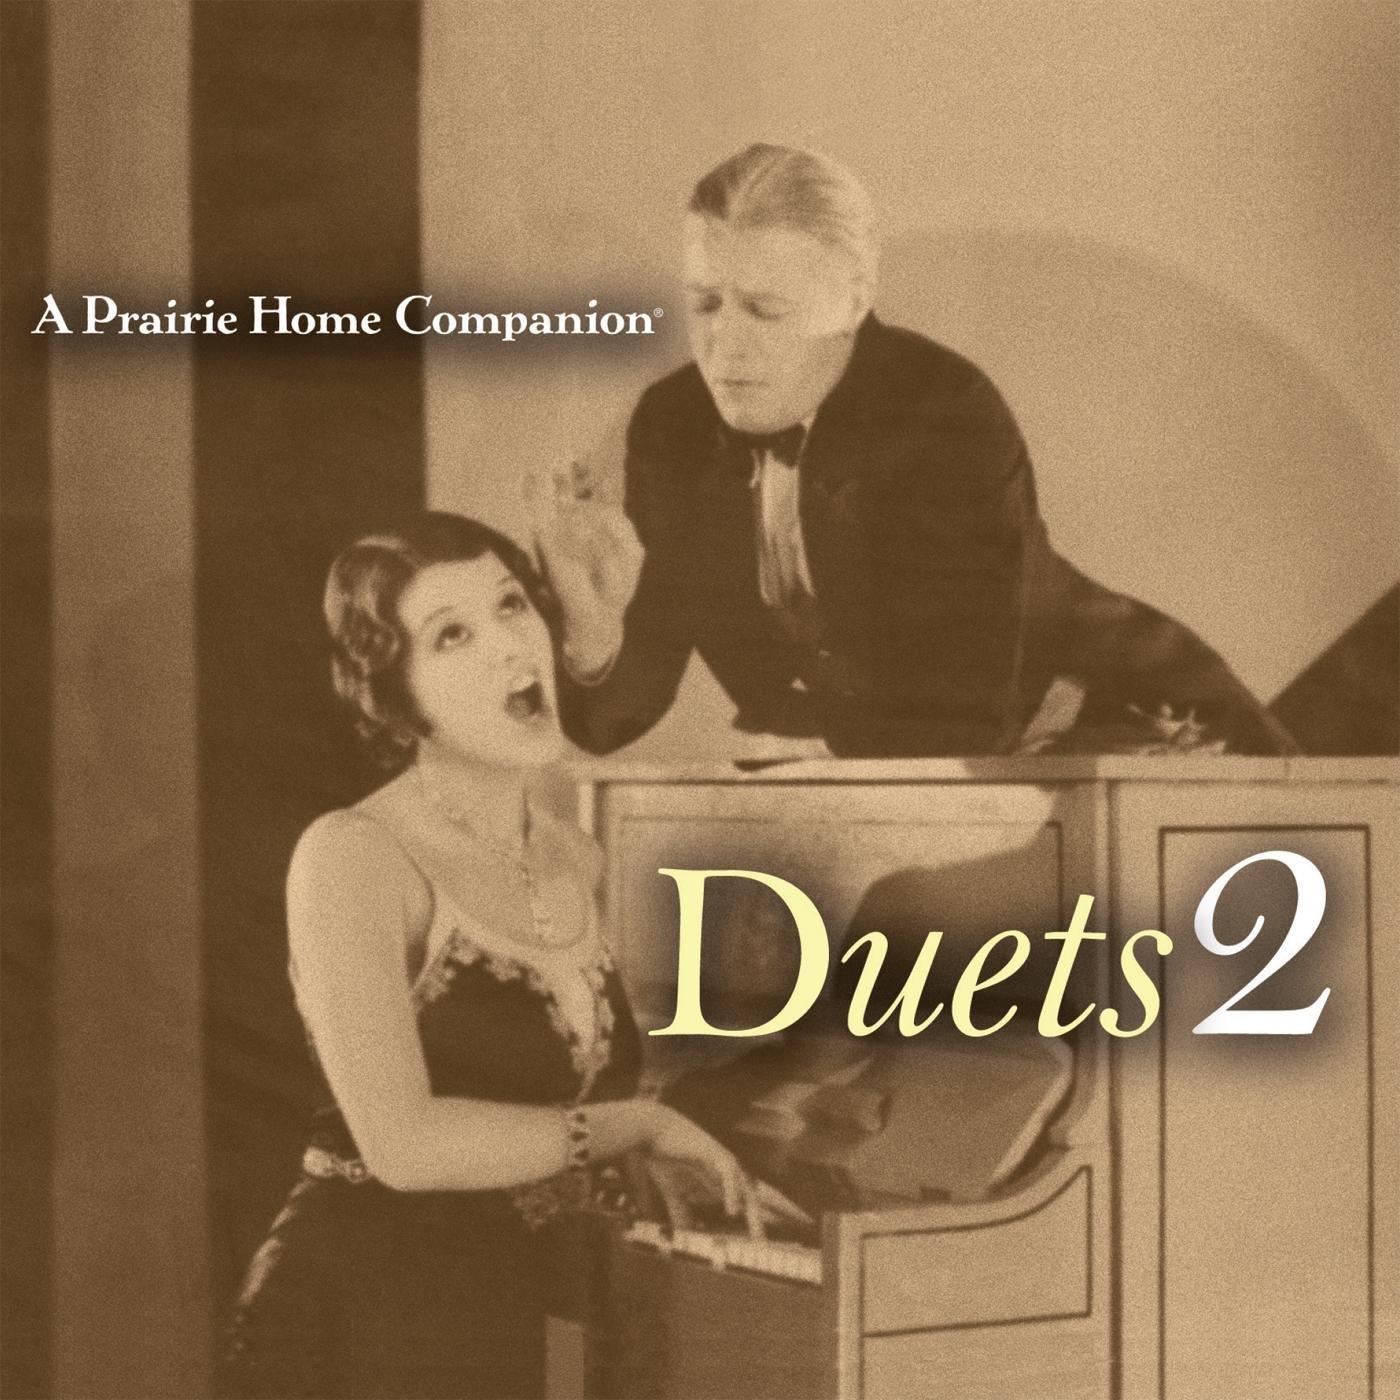 Author/geoffrey Garrison/page/2 >> A Prairie Home Companion Duets 2 Garrison Keillor